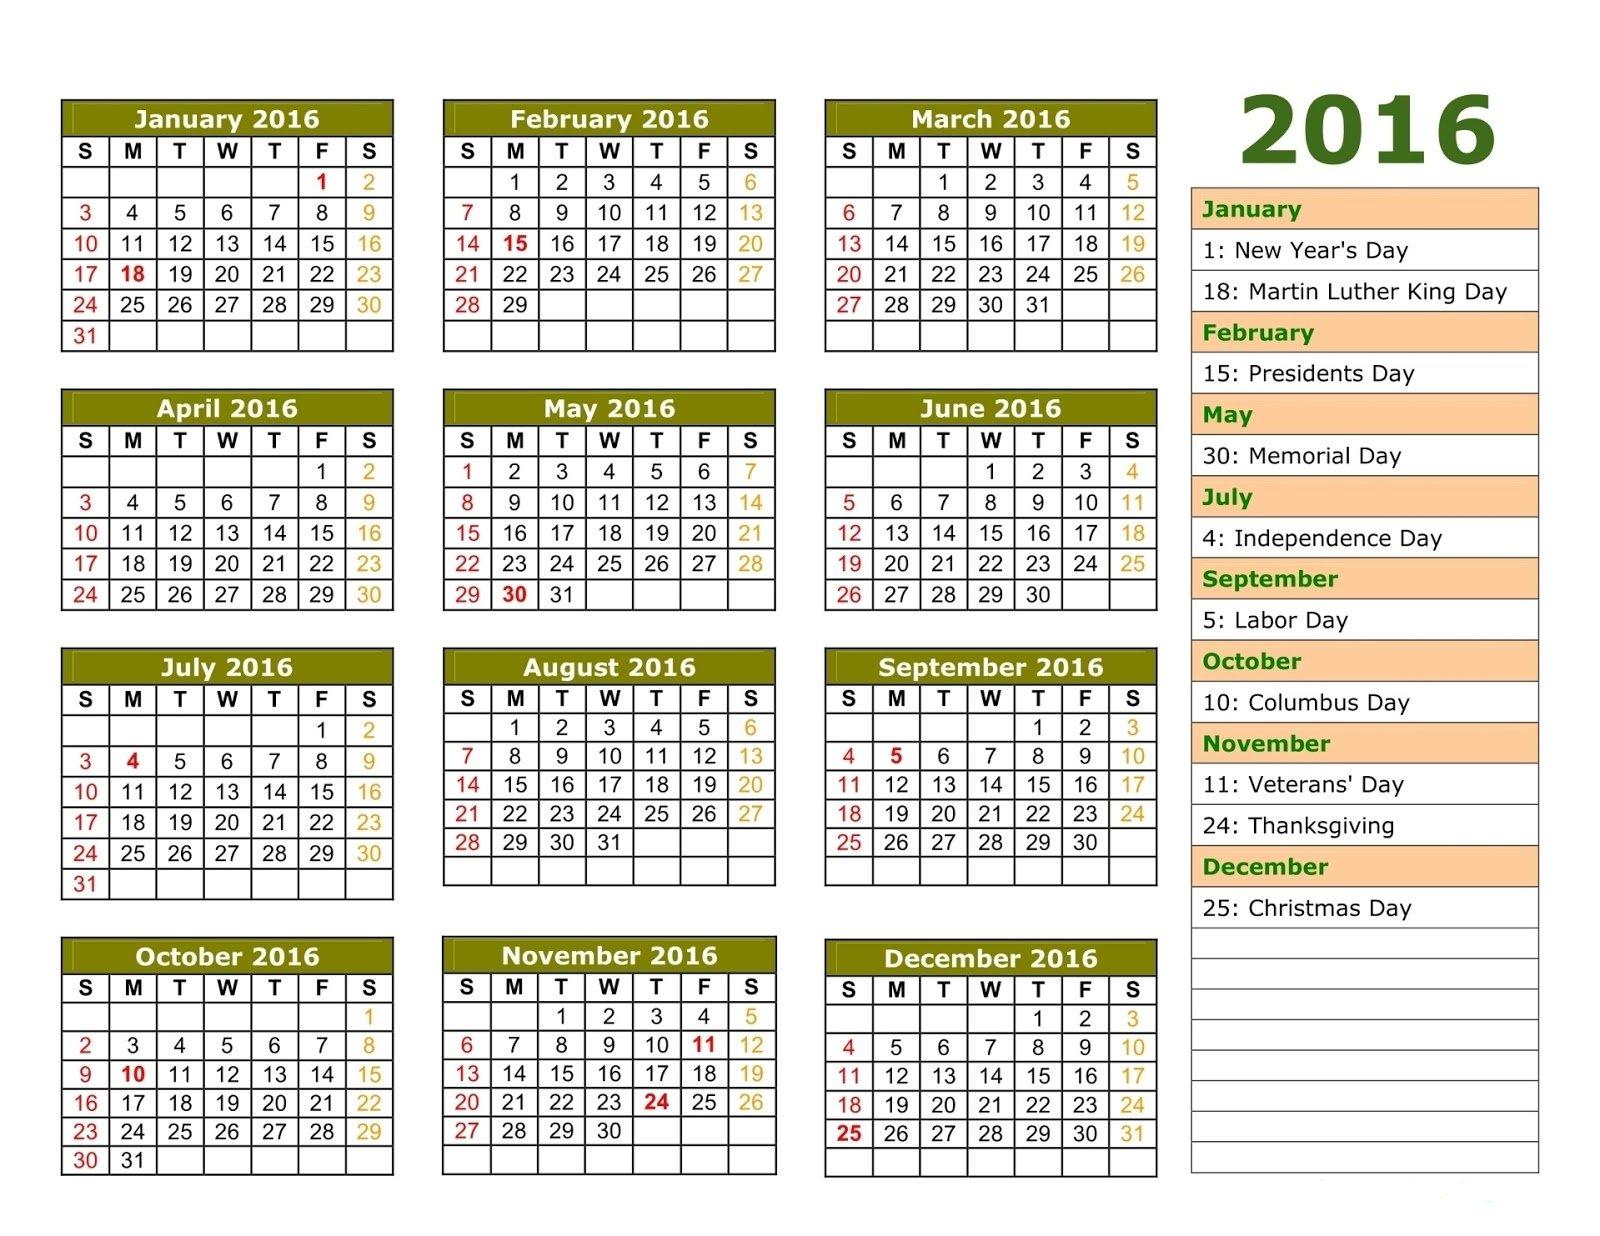 2016 Printable Calendar With European Holidays Printable 2016 Calendar With Notes